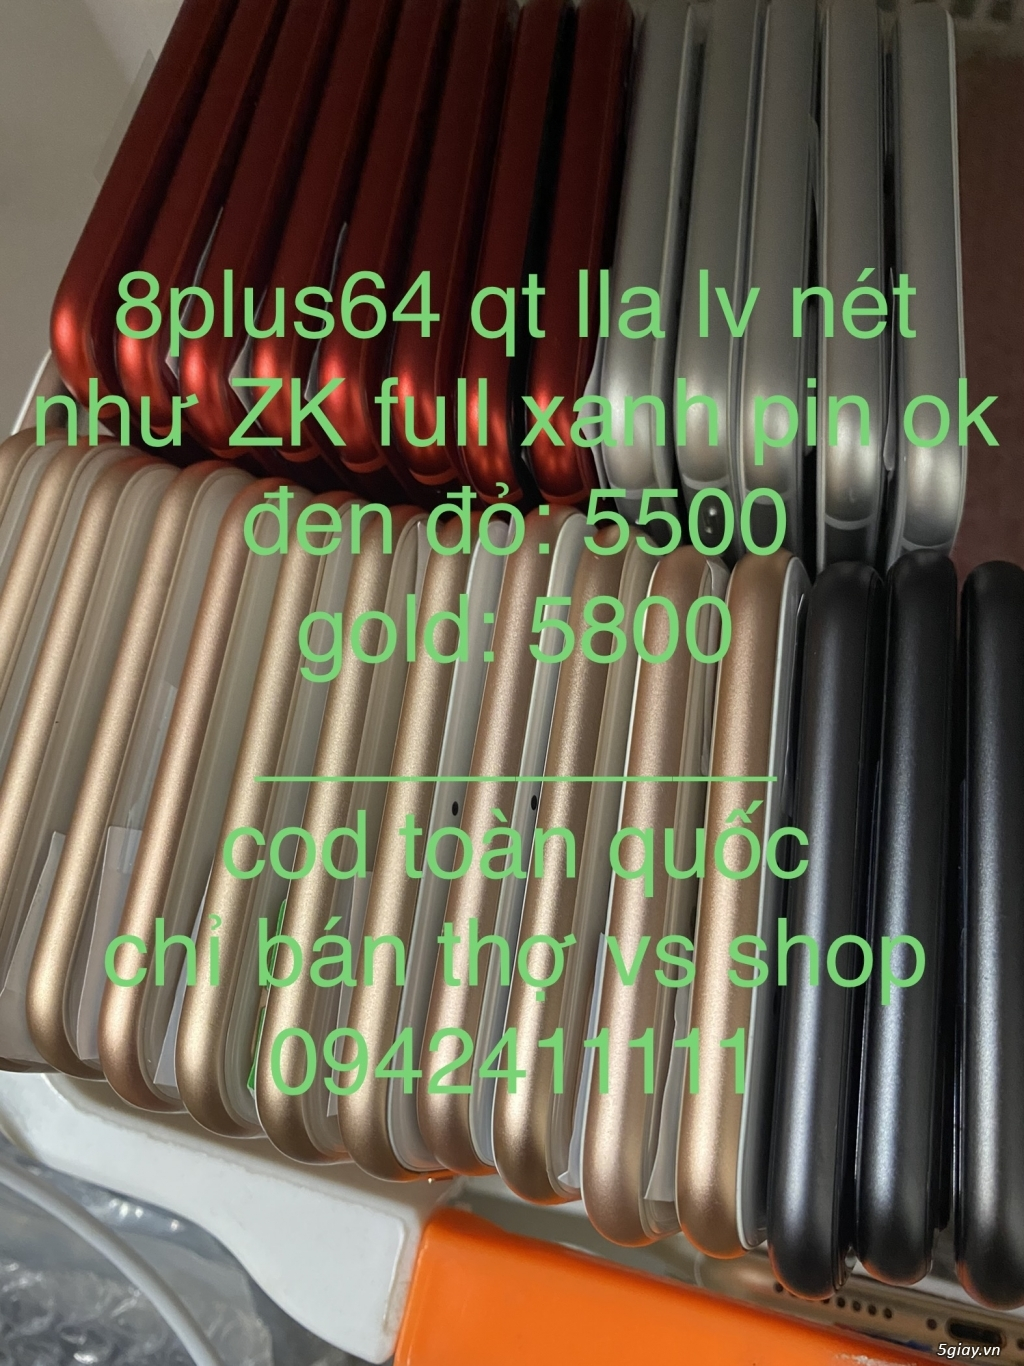 Bảng Giá Sỉ iPhone 6s | 6splus | 7g | 7plus | 8g | 8plus QT lla (COD) - 5